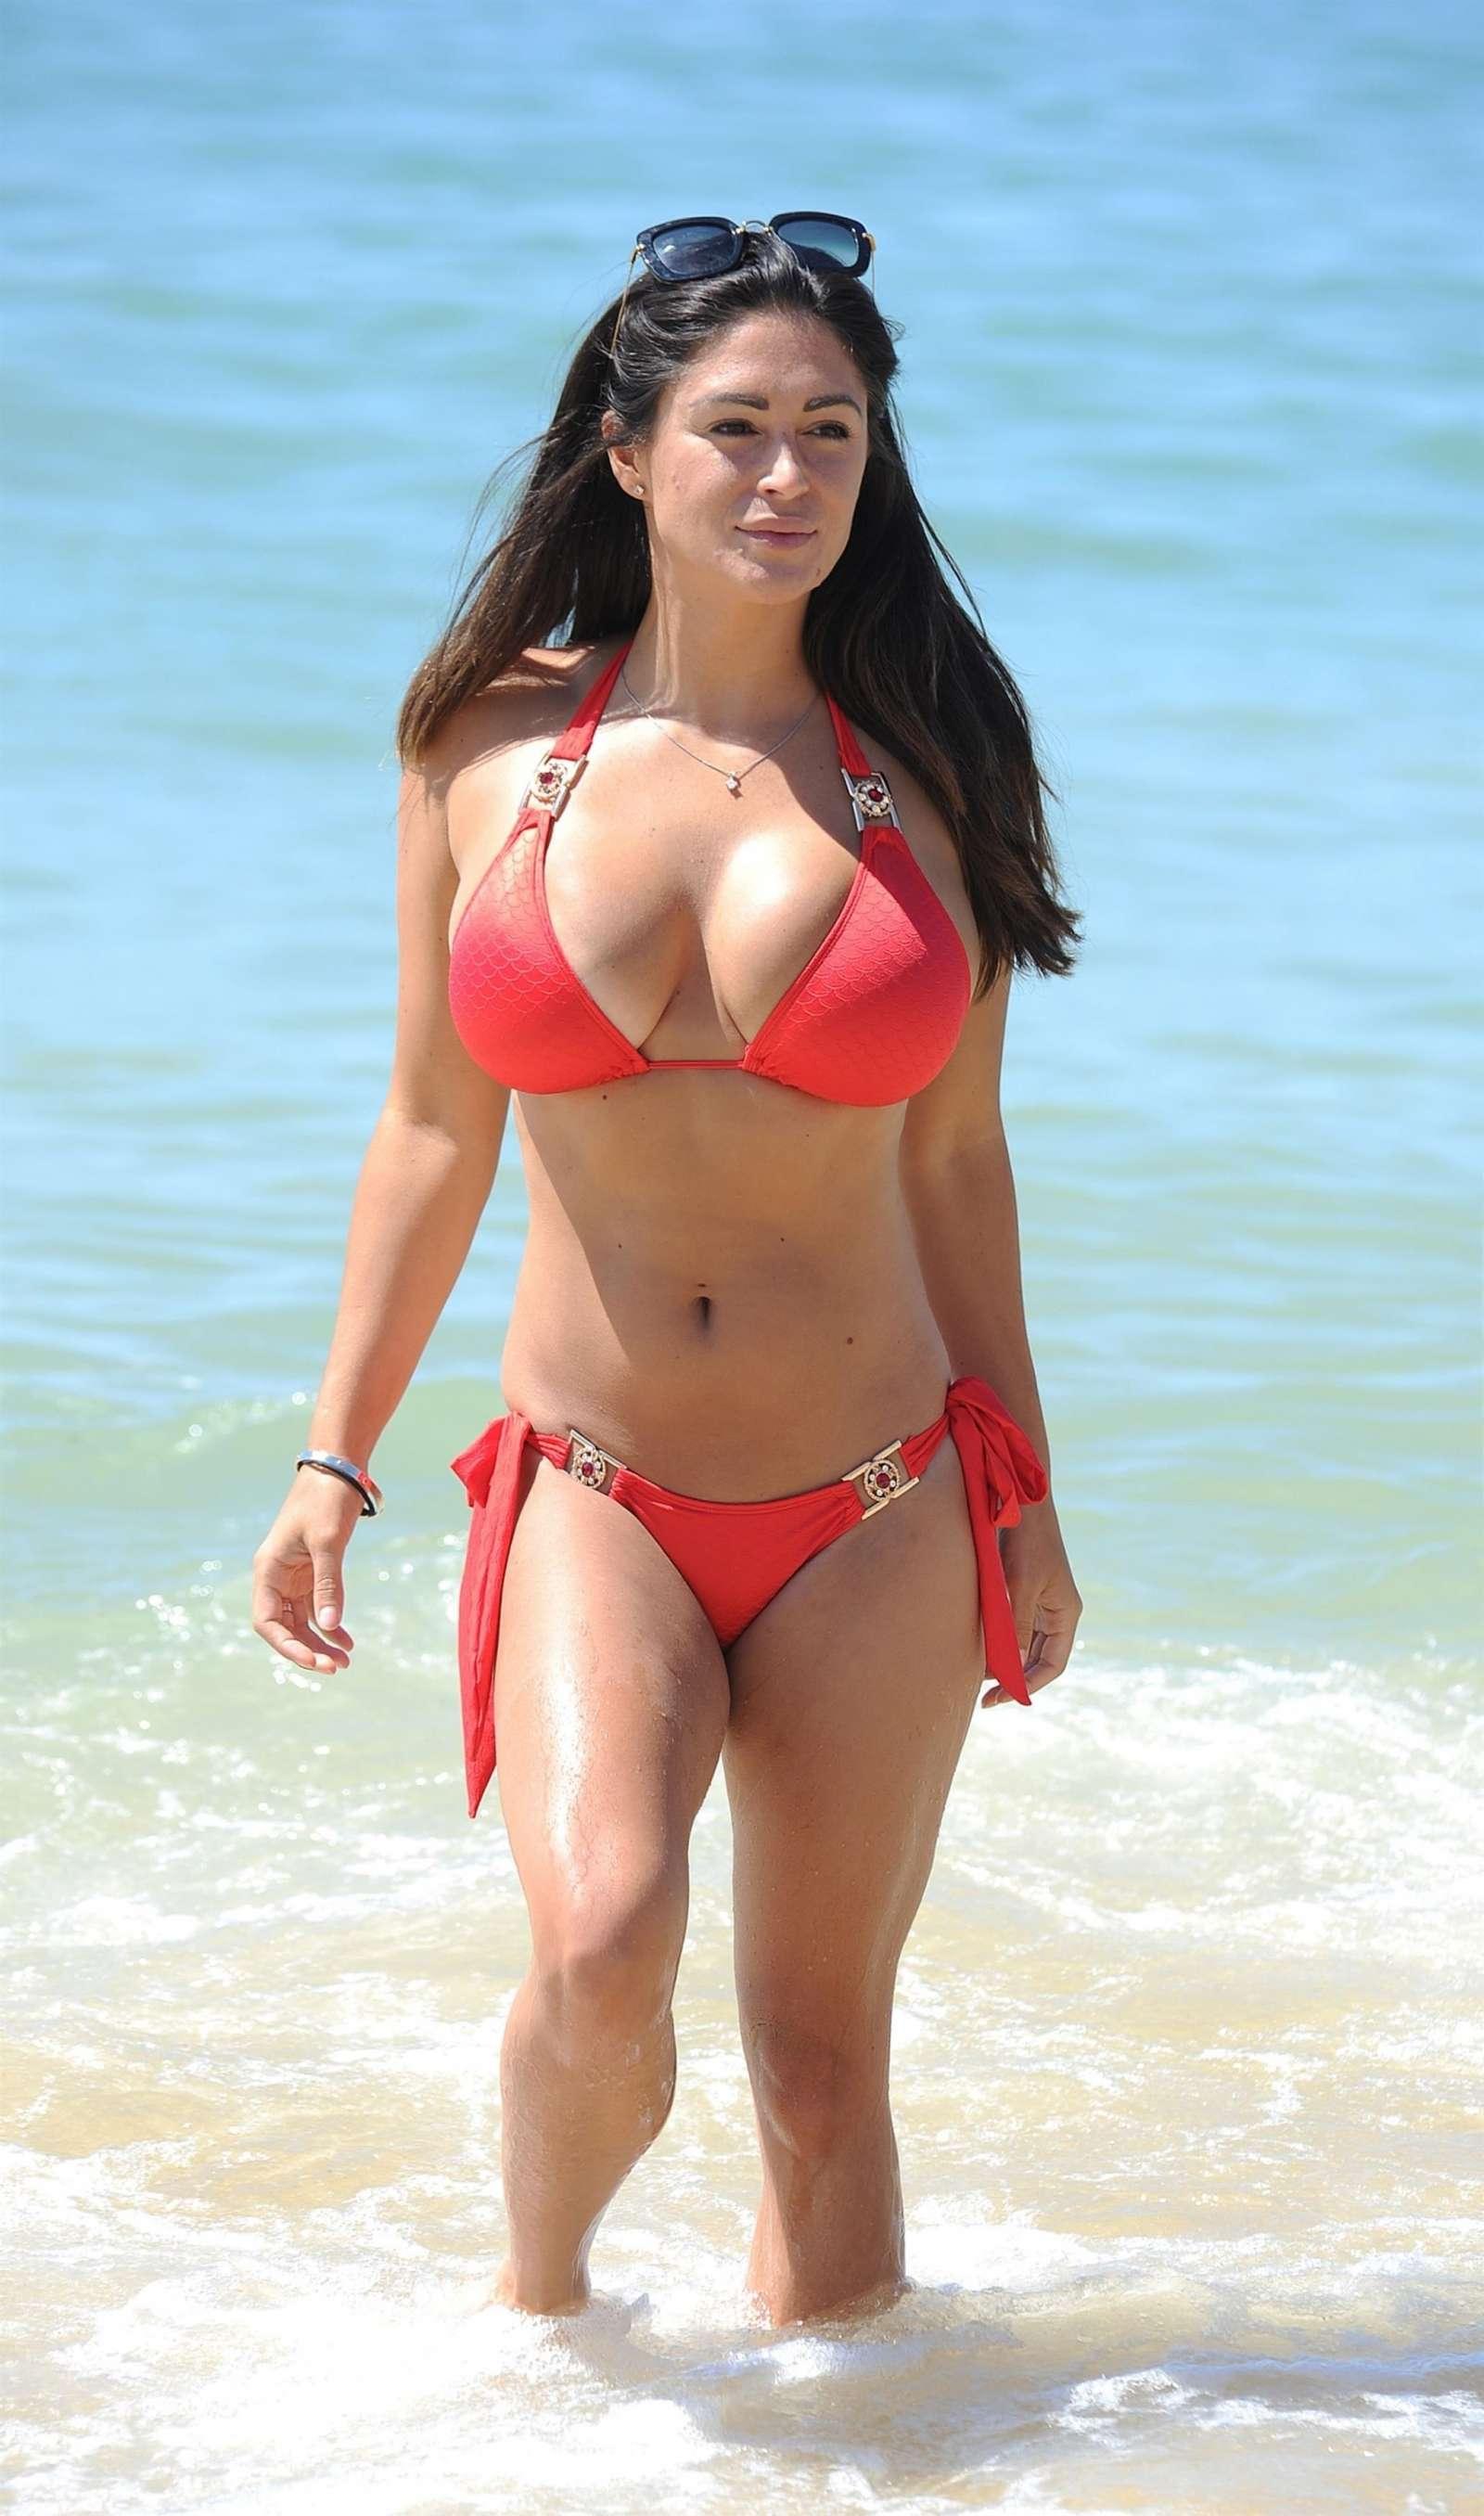 Casey Batchelor in tiny black bikini on the beach in Cyprus Pic 14 of 35